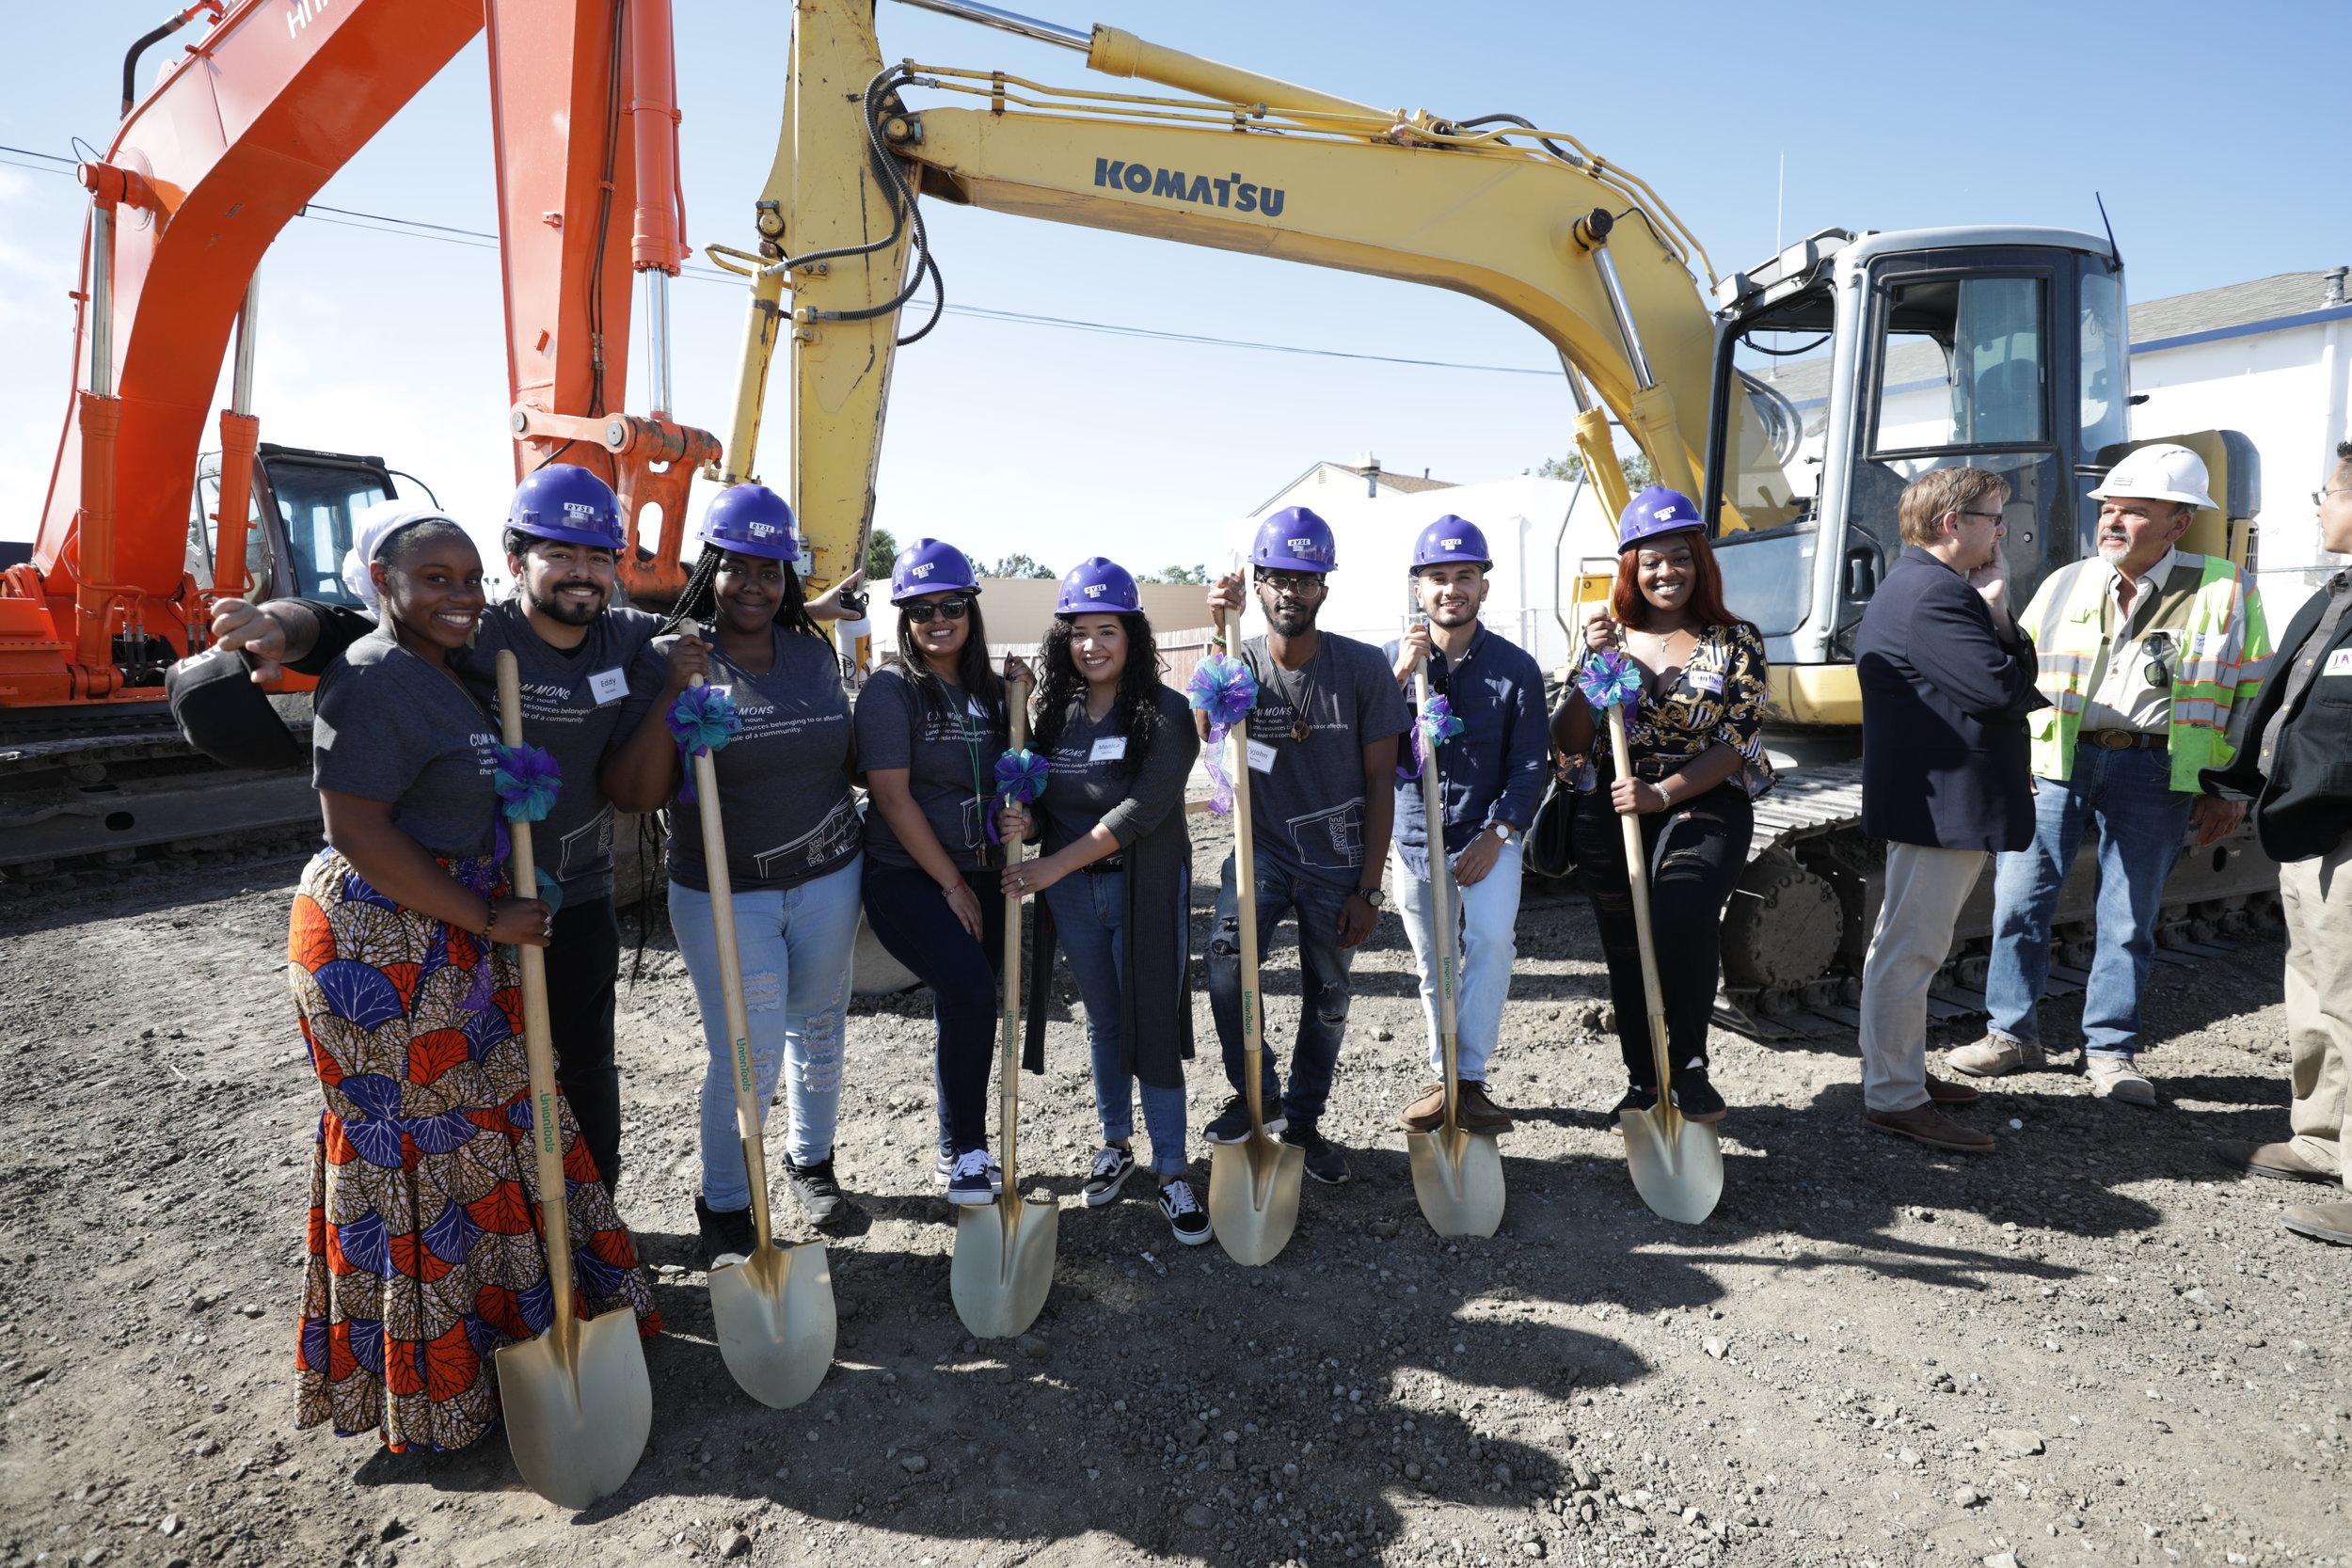 From Left to Right:  Former youth members, most of whom are currently RYSE staff. Ciera-Jevae Gordon, Eddy Chacon, Gemikia Henderson, Dalia Ramos, Monica Diaz, Tyjohn Sykes, Edgar Rosales, and Cynthia Ezeokoli.